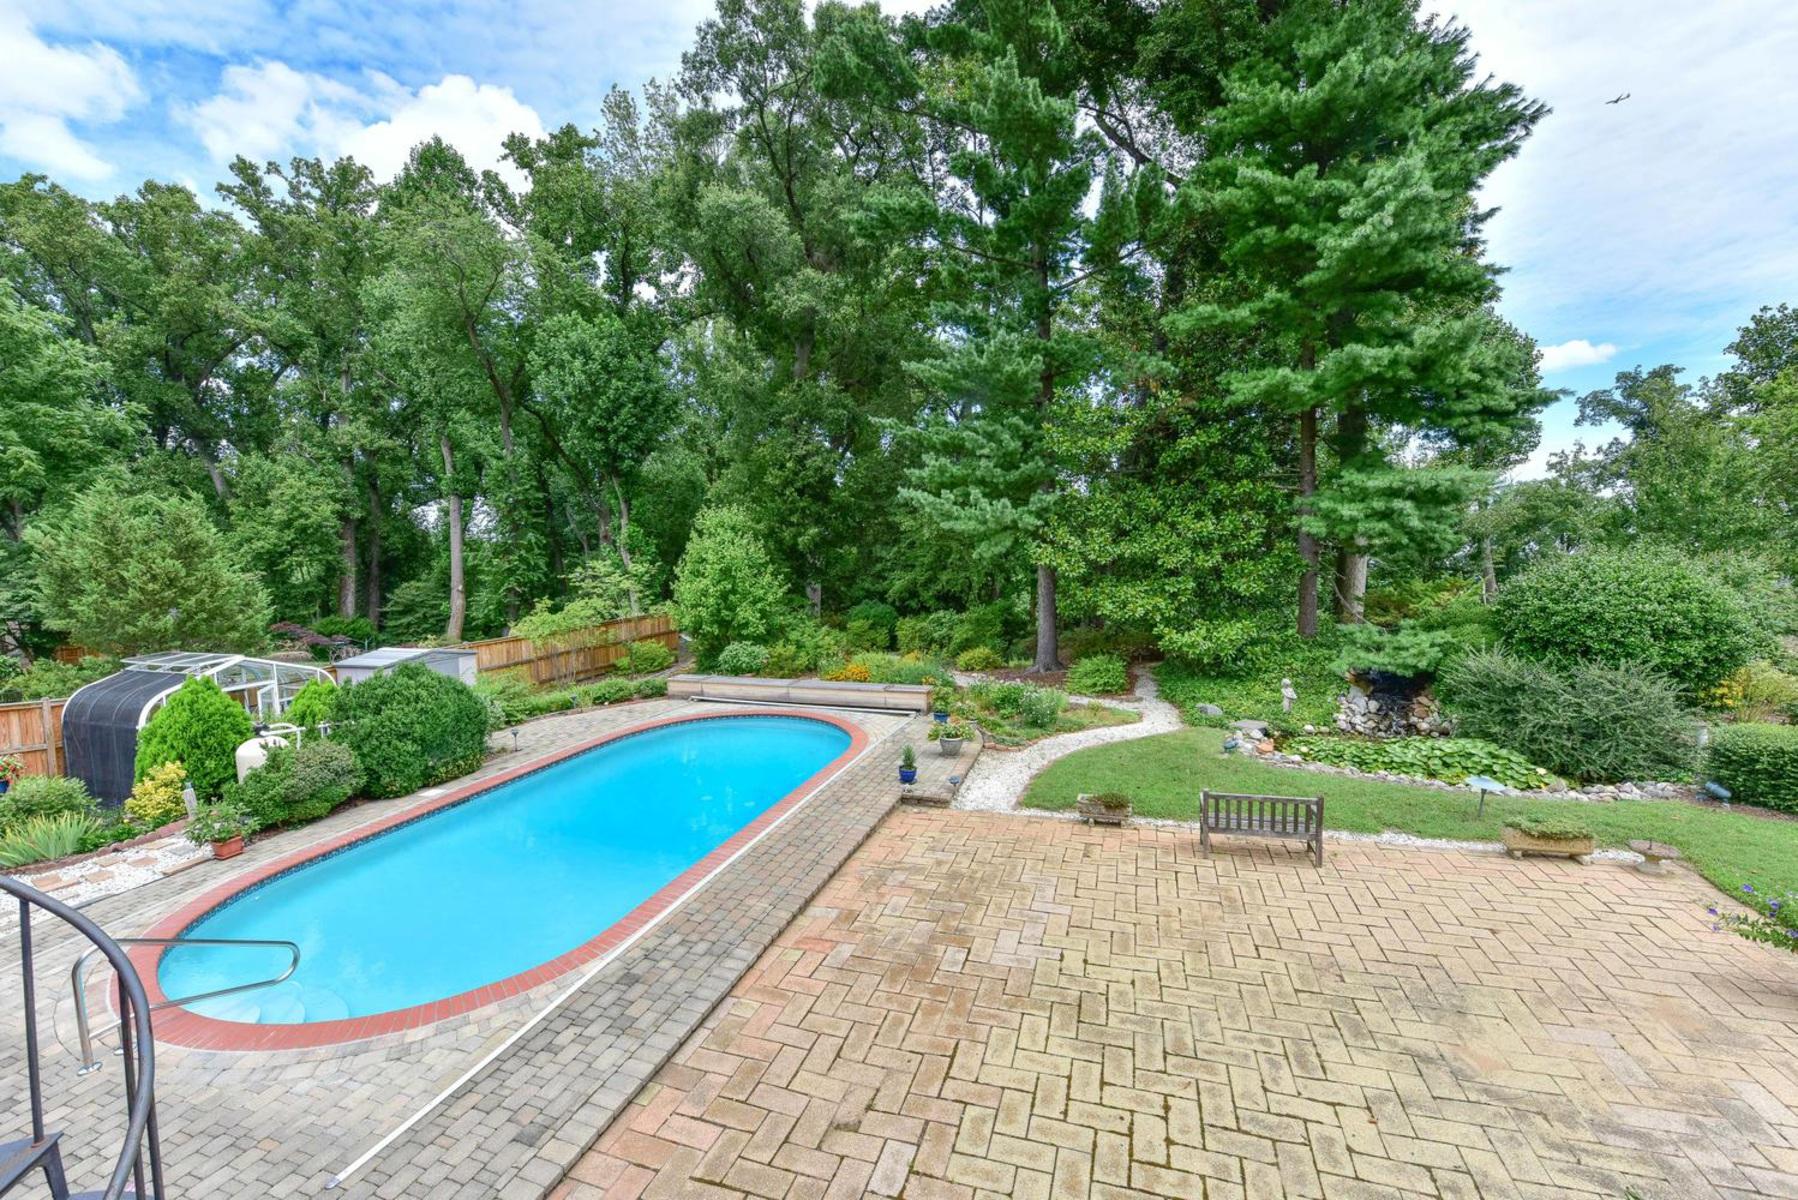 Additional photo for property listing at Wellington Heights 7609 Ridgecrest Dr Alexandria, Virginia 22308 Estados Unidos